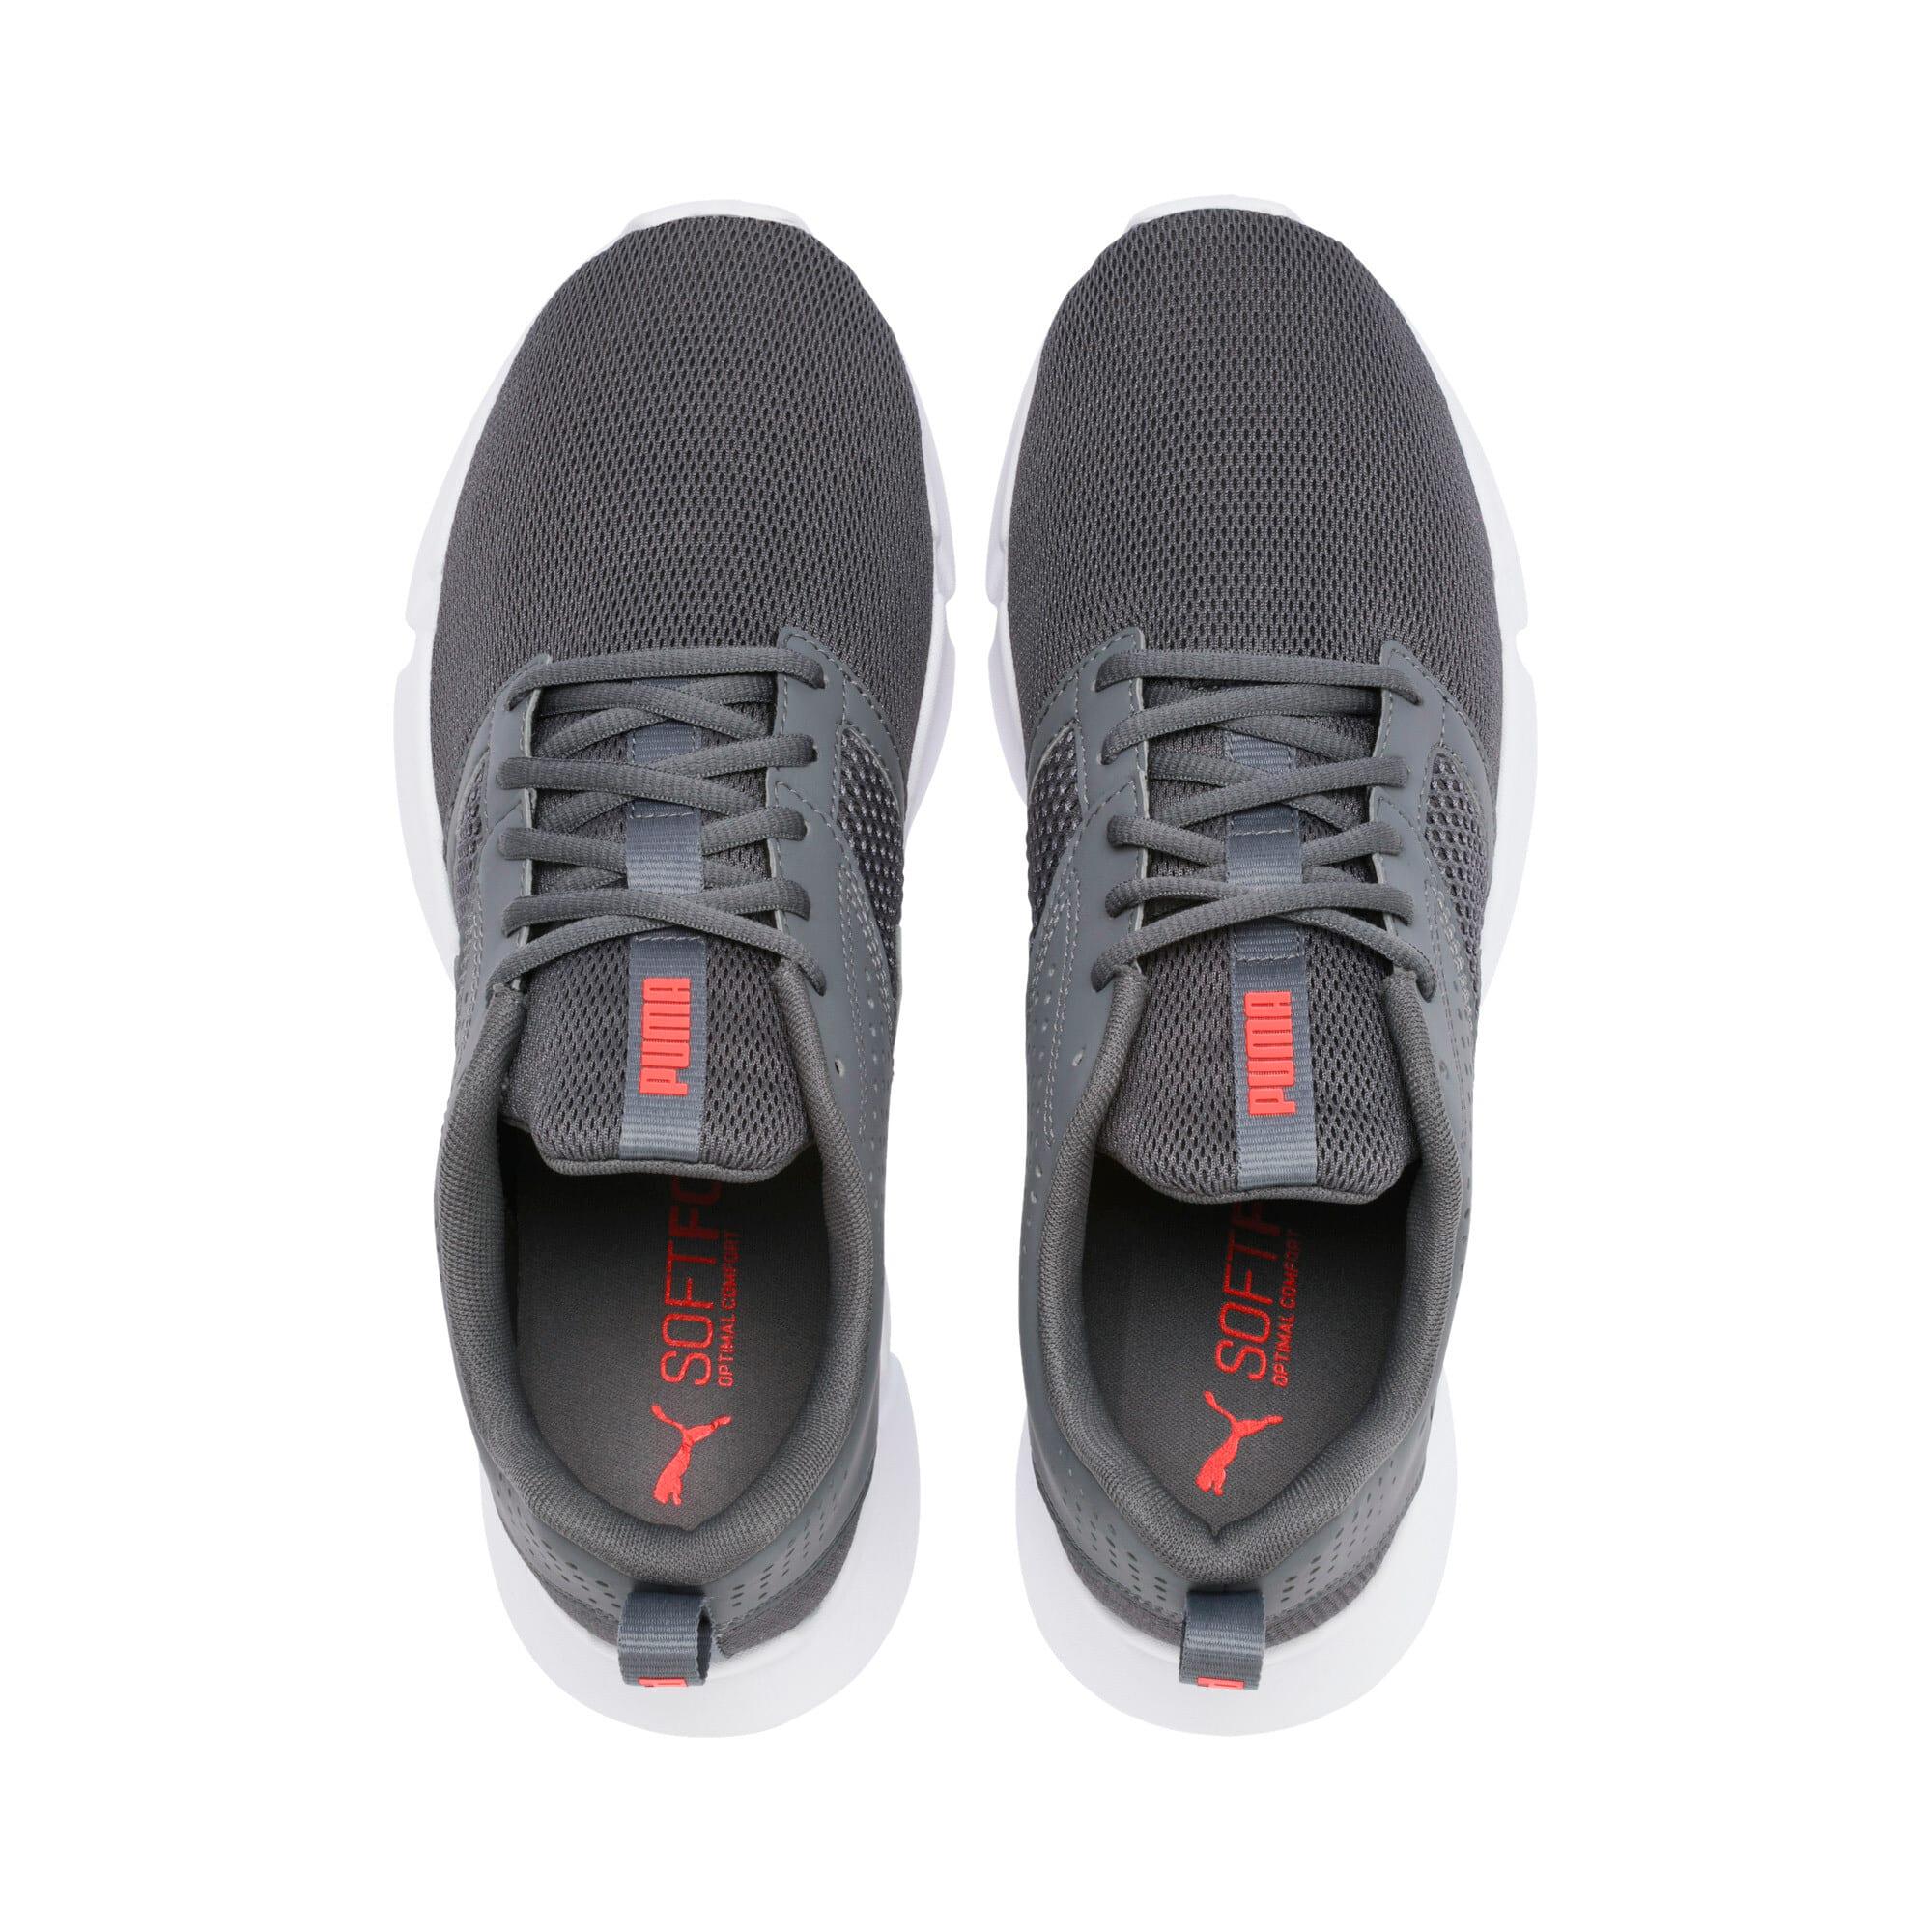 Thumbnail 7 of INTERFLEX Modern Sneakers, CASTLEROCK-Black-Nrgy Red, medium